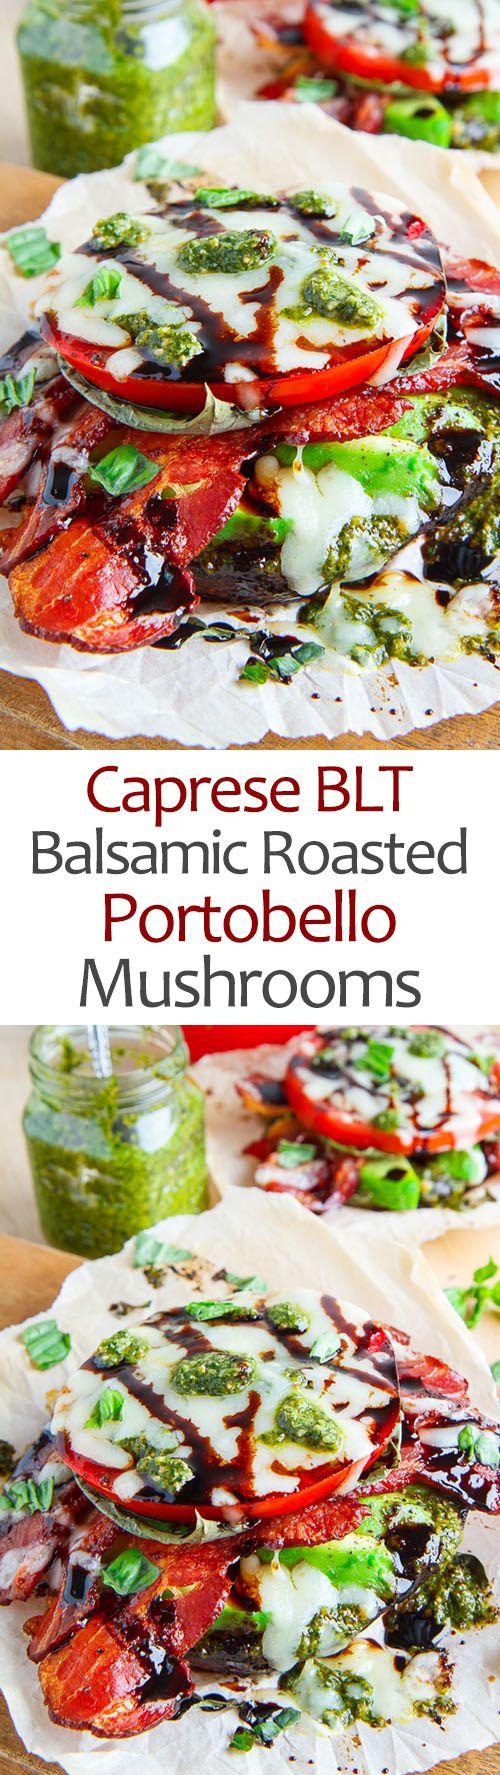 Caprese BLT Balsamic Roasted Portobello Mushrooms